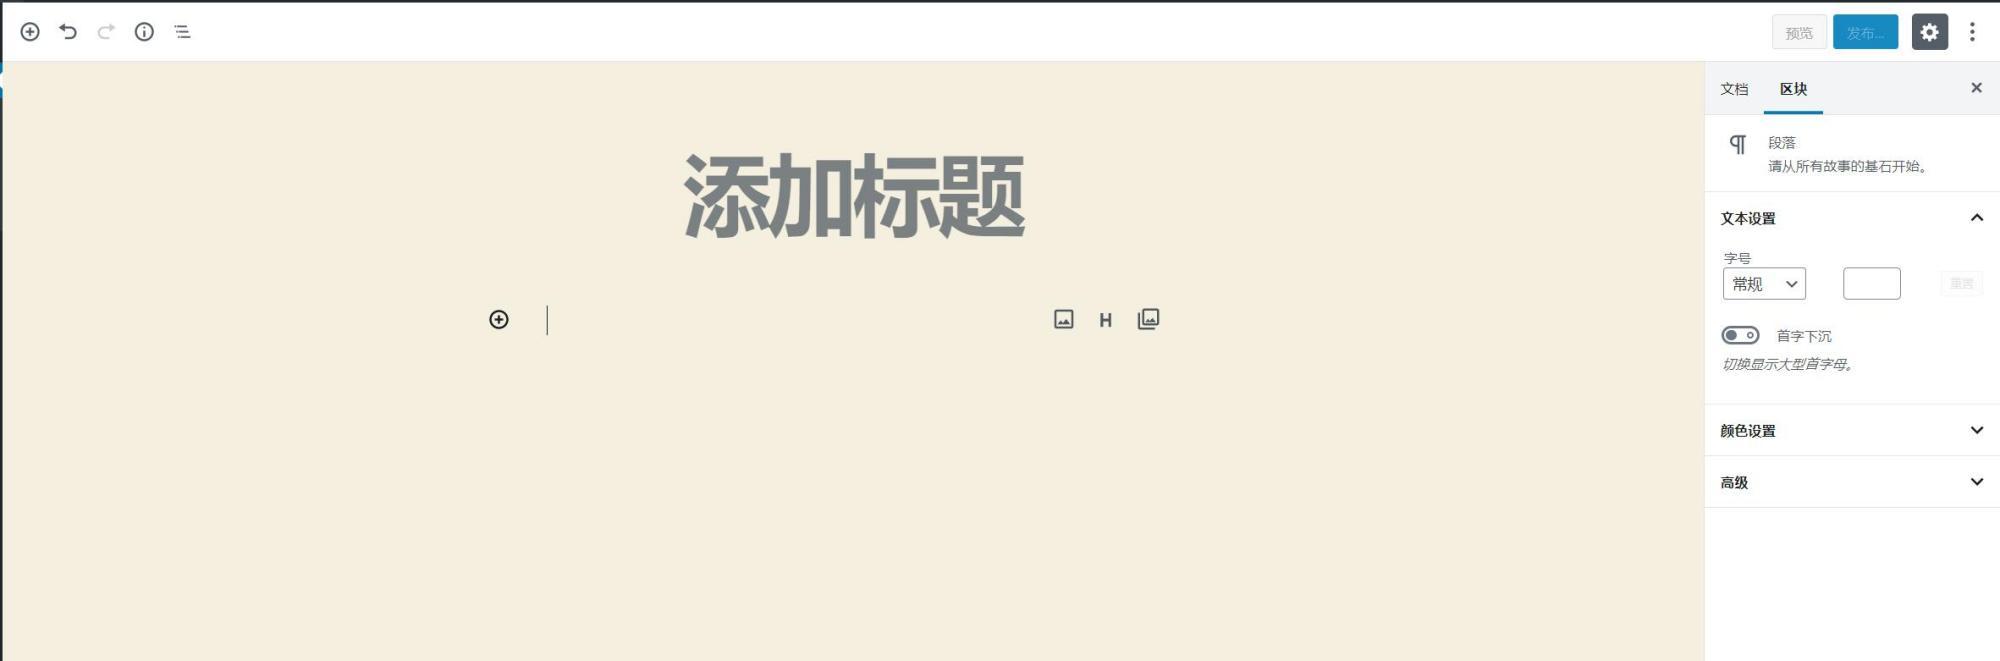 wordpress进阶设置和高级优化:使用 Markdown 替换原编辑器  第1张